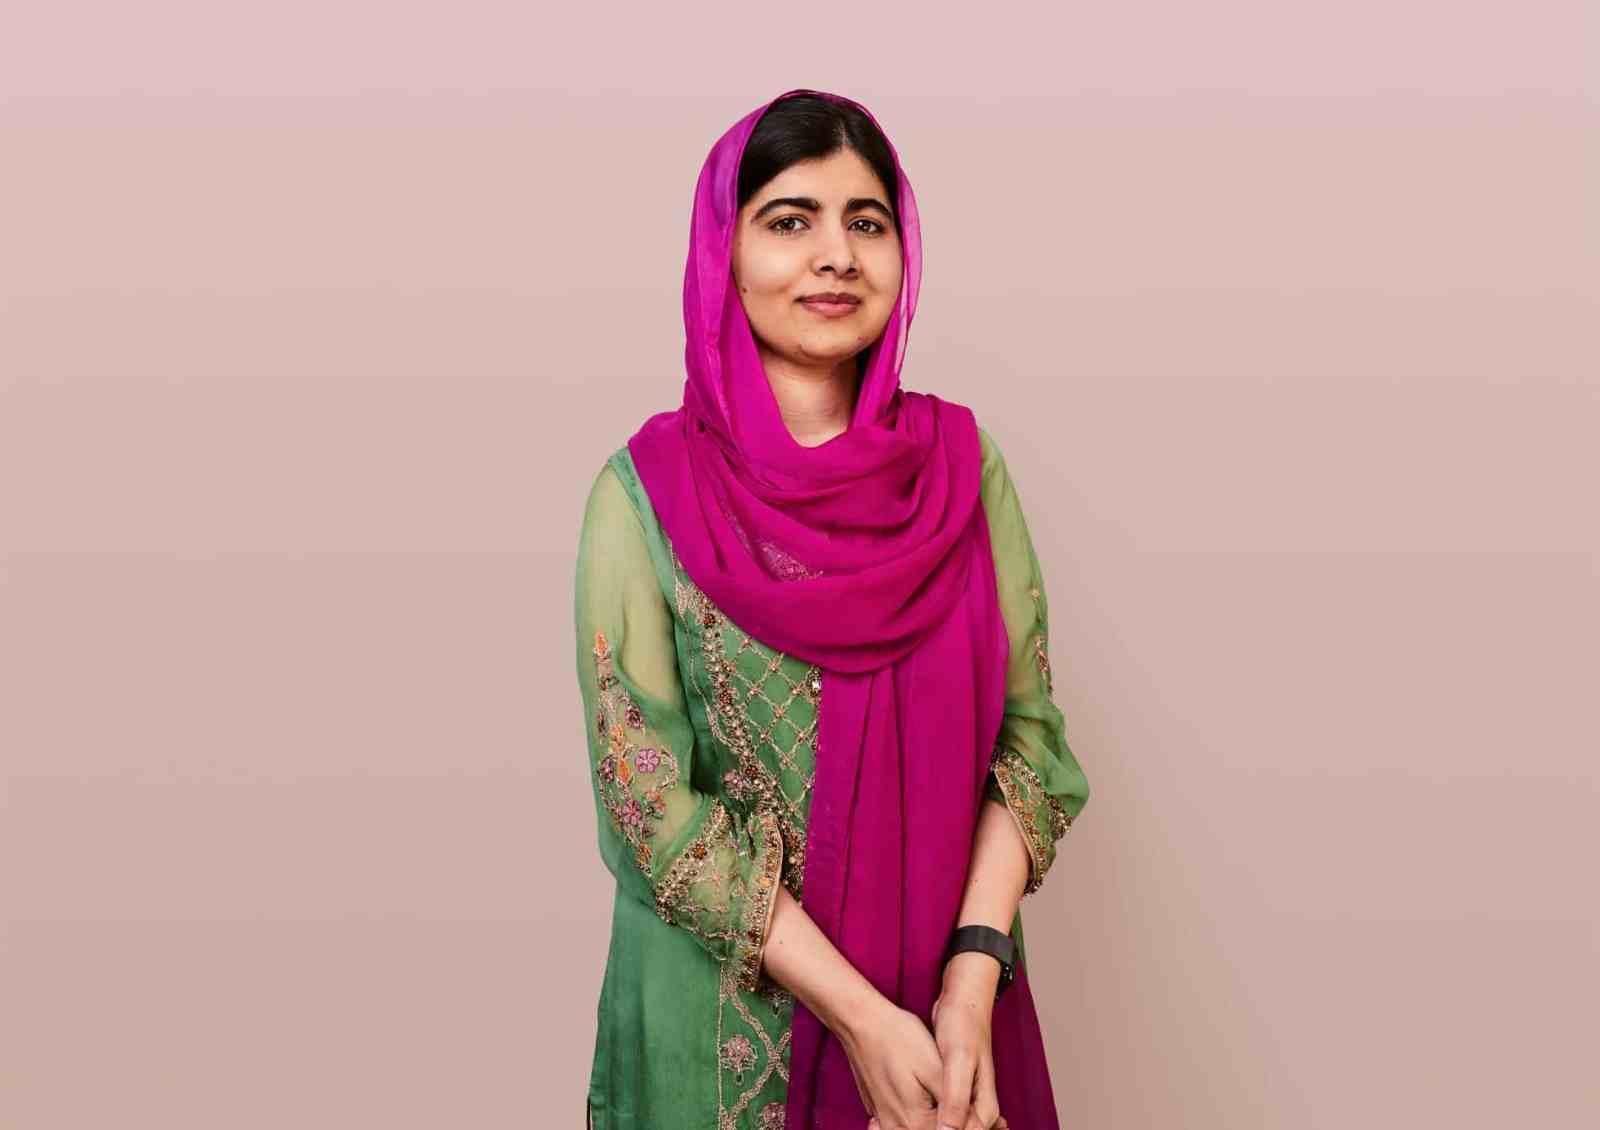 Apple TV+ announced a multiyear partnership with Malala Yousafzai